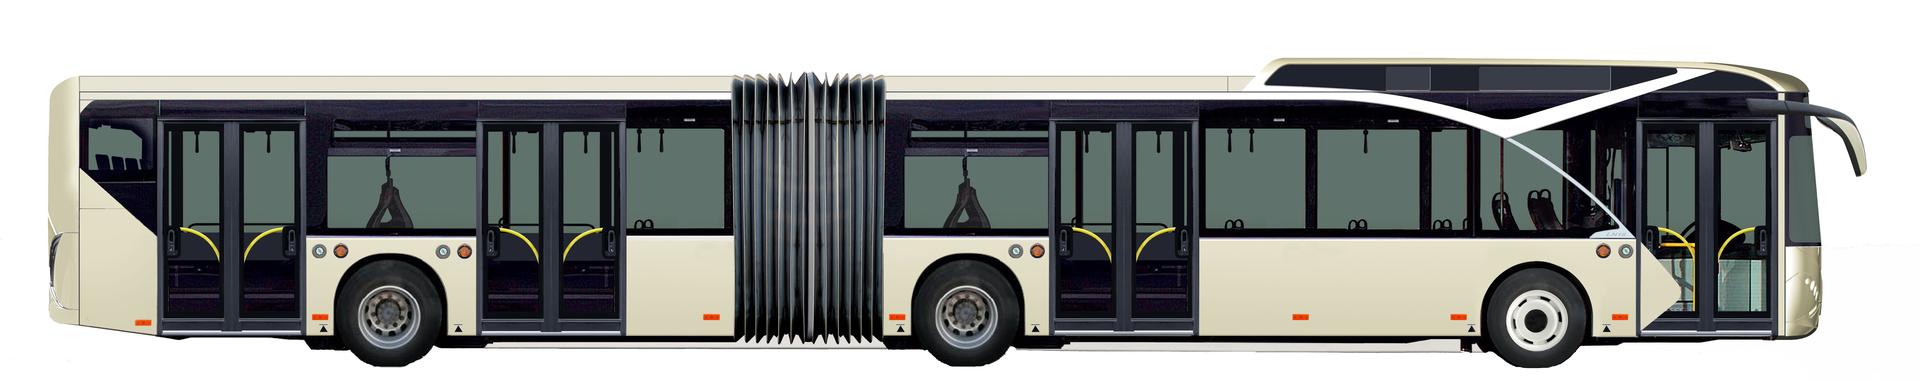 bmz-elektrobus-batterien